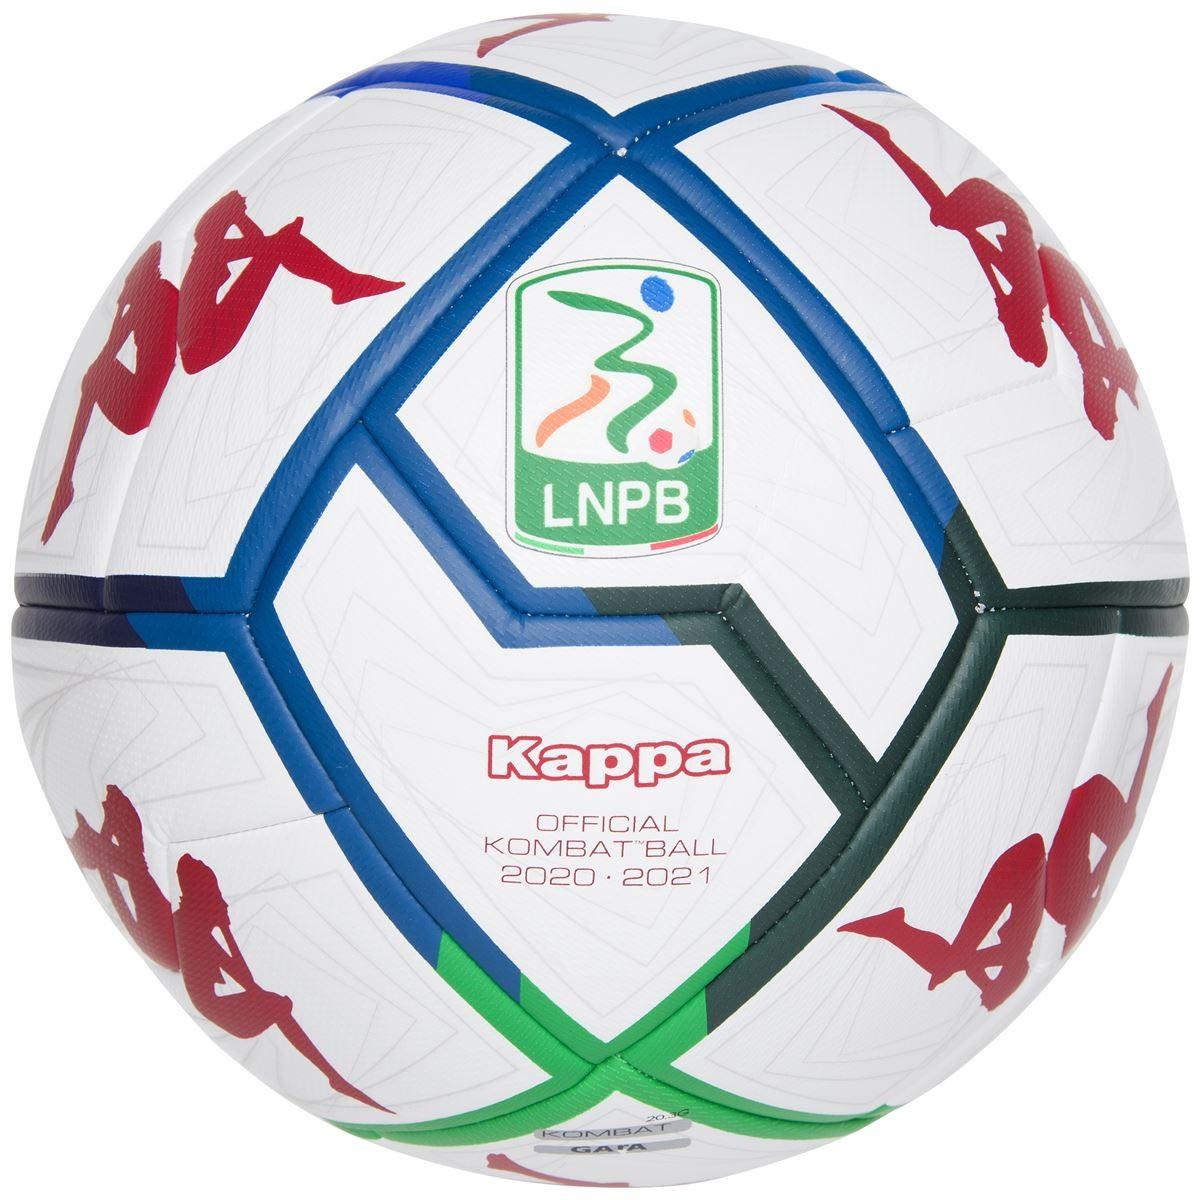 kappa pallone national league series b 2020 21 cut 5 maglie calciatori